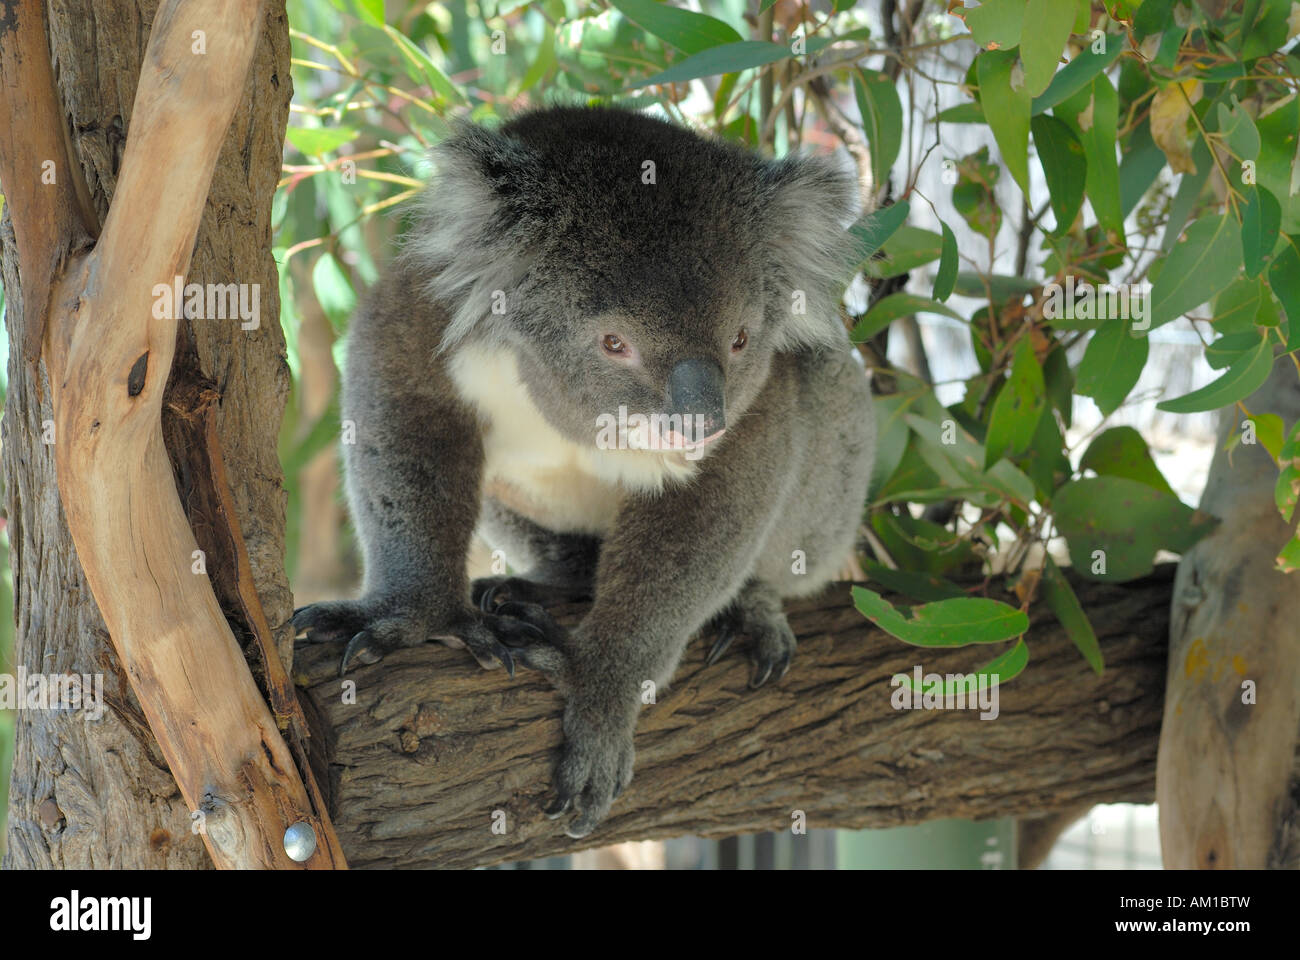 Cleland Wildlife Park Koala Adelaide Hills South Australia Stock